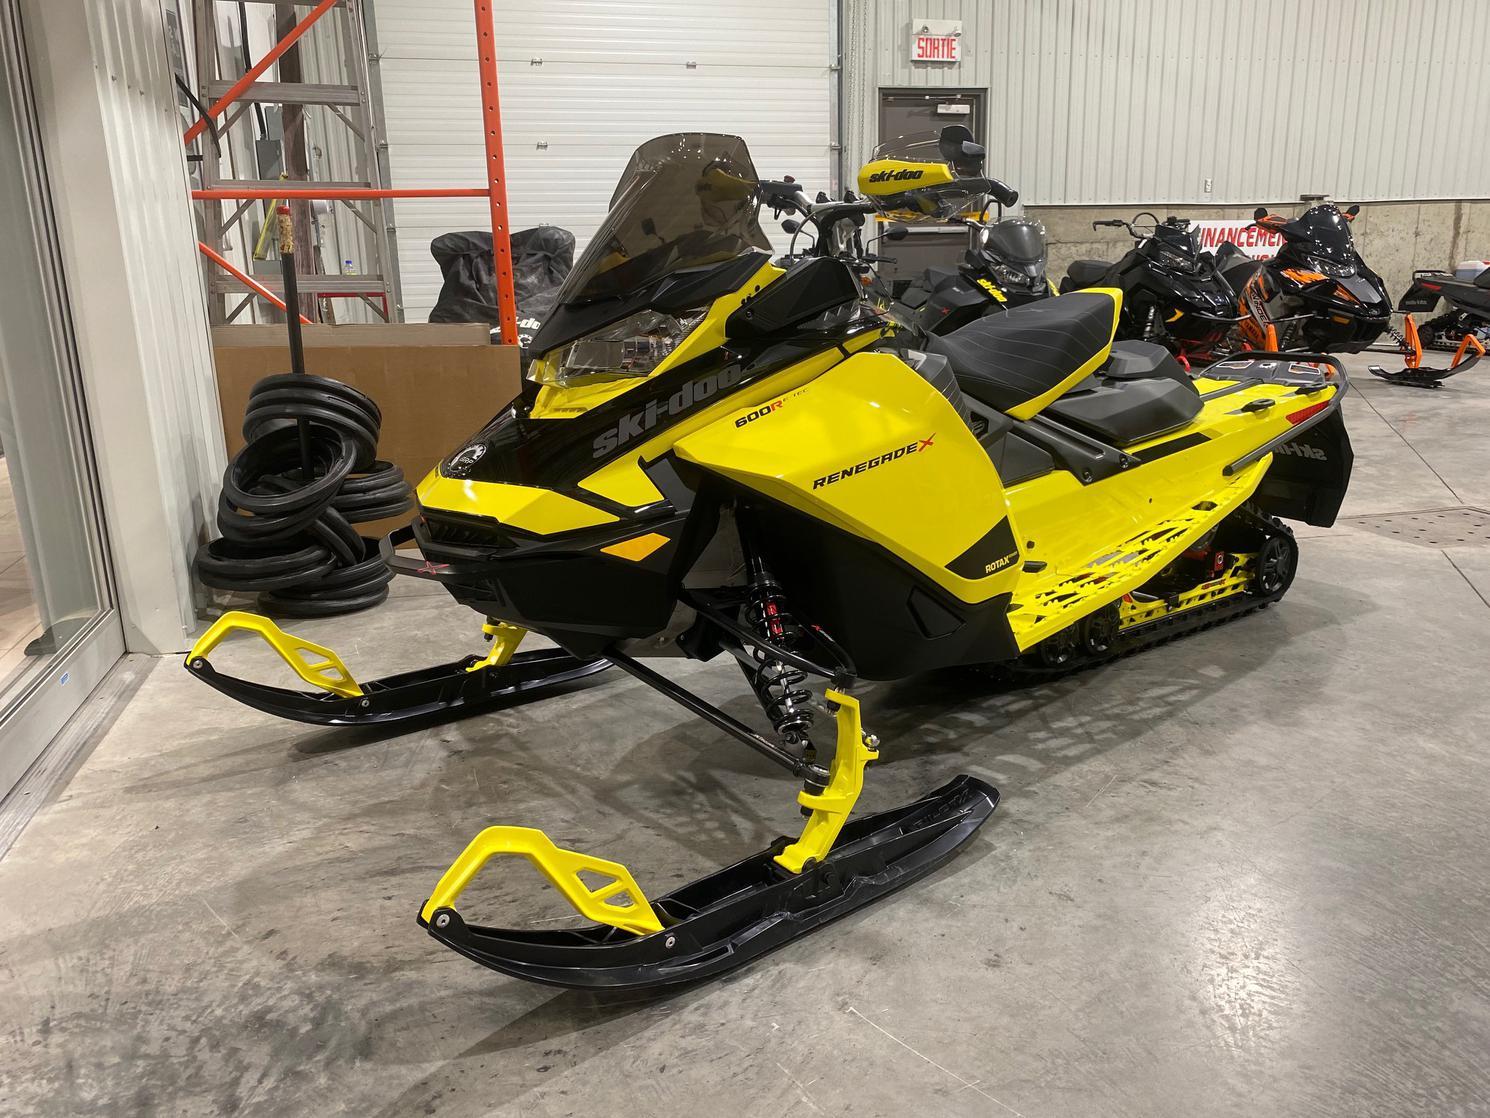 Ski-Doo Renegade X 600 R 2021 - 600R E-Tec 2 temps